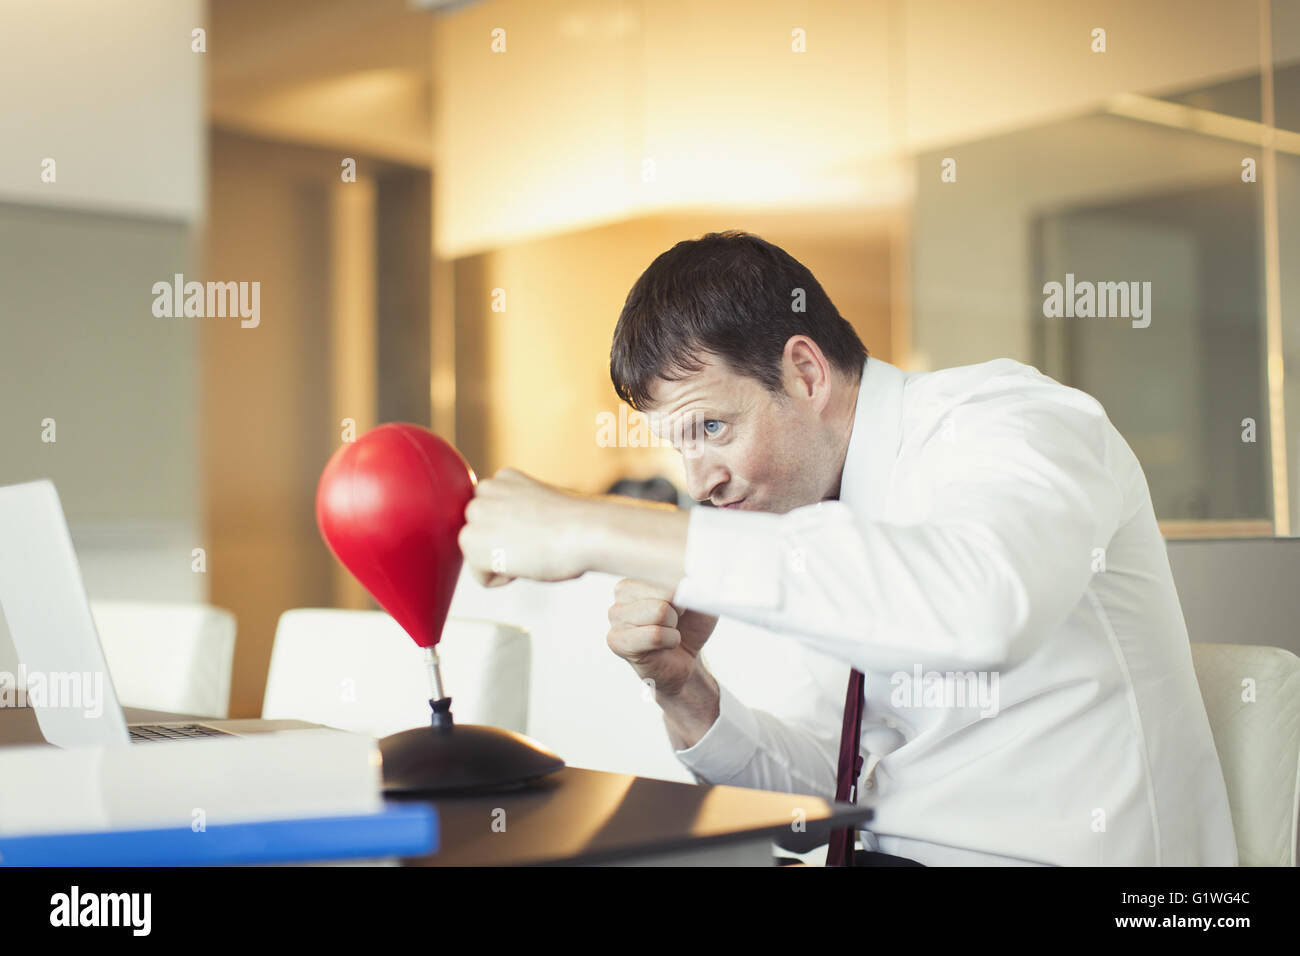 Wonderful Businessman Punching Toy Punching Bag In Office